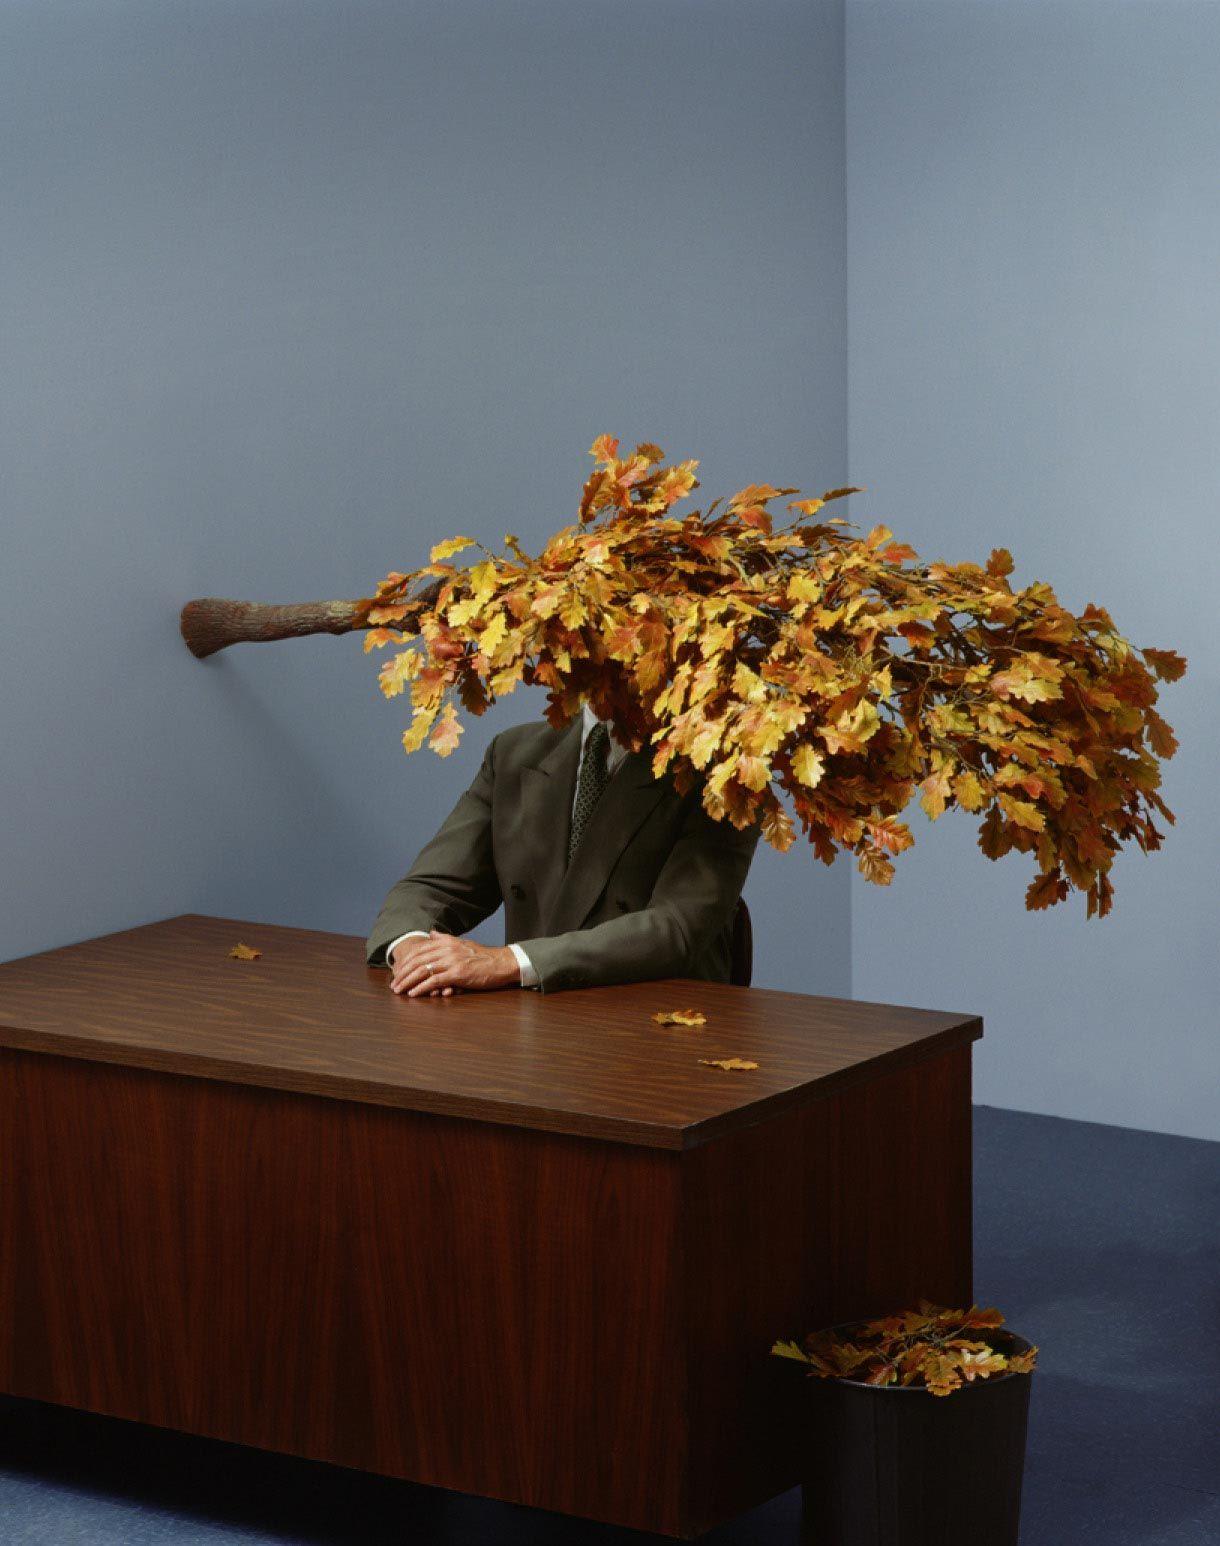 Hugh Kretschmer, Lost in Work ©